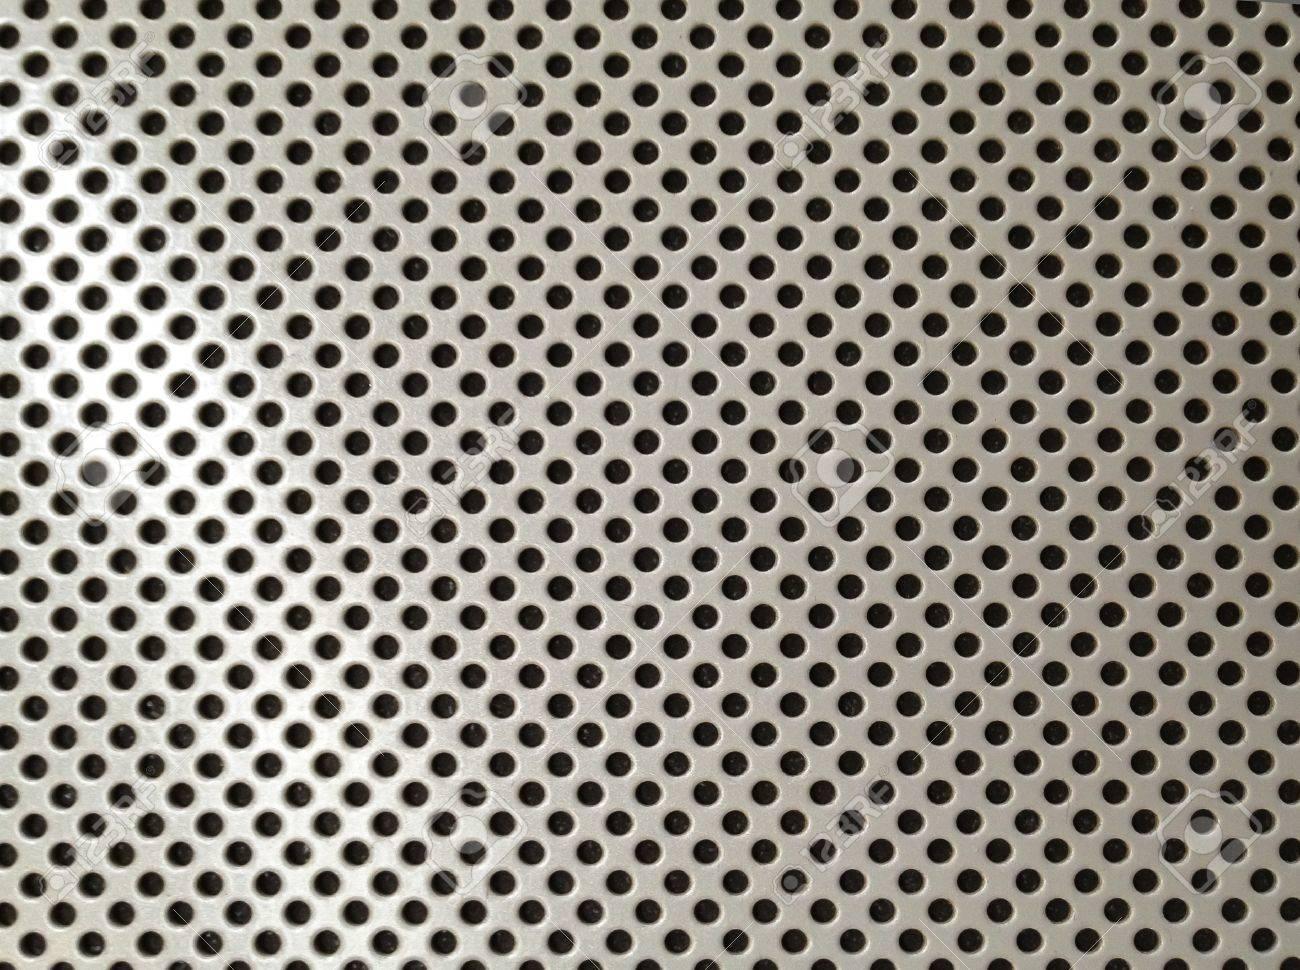 metallic grill cross wall wood texture background Stock Photo - 18374442